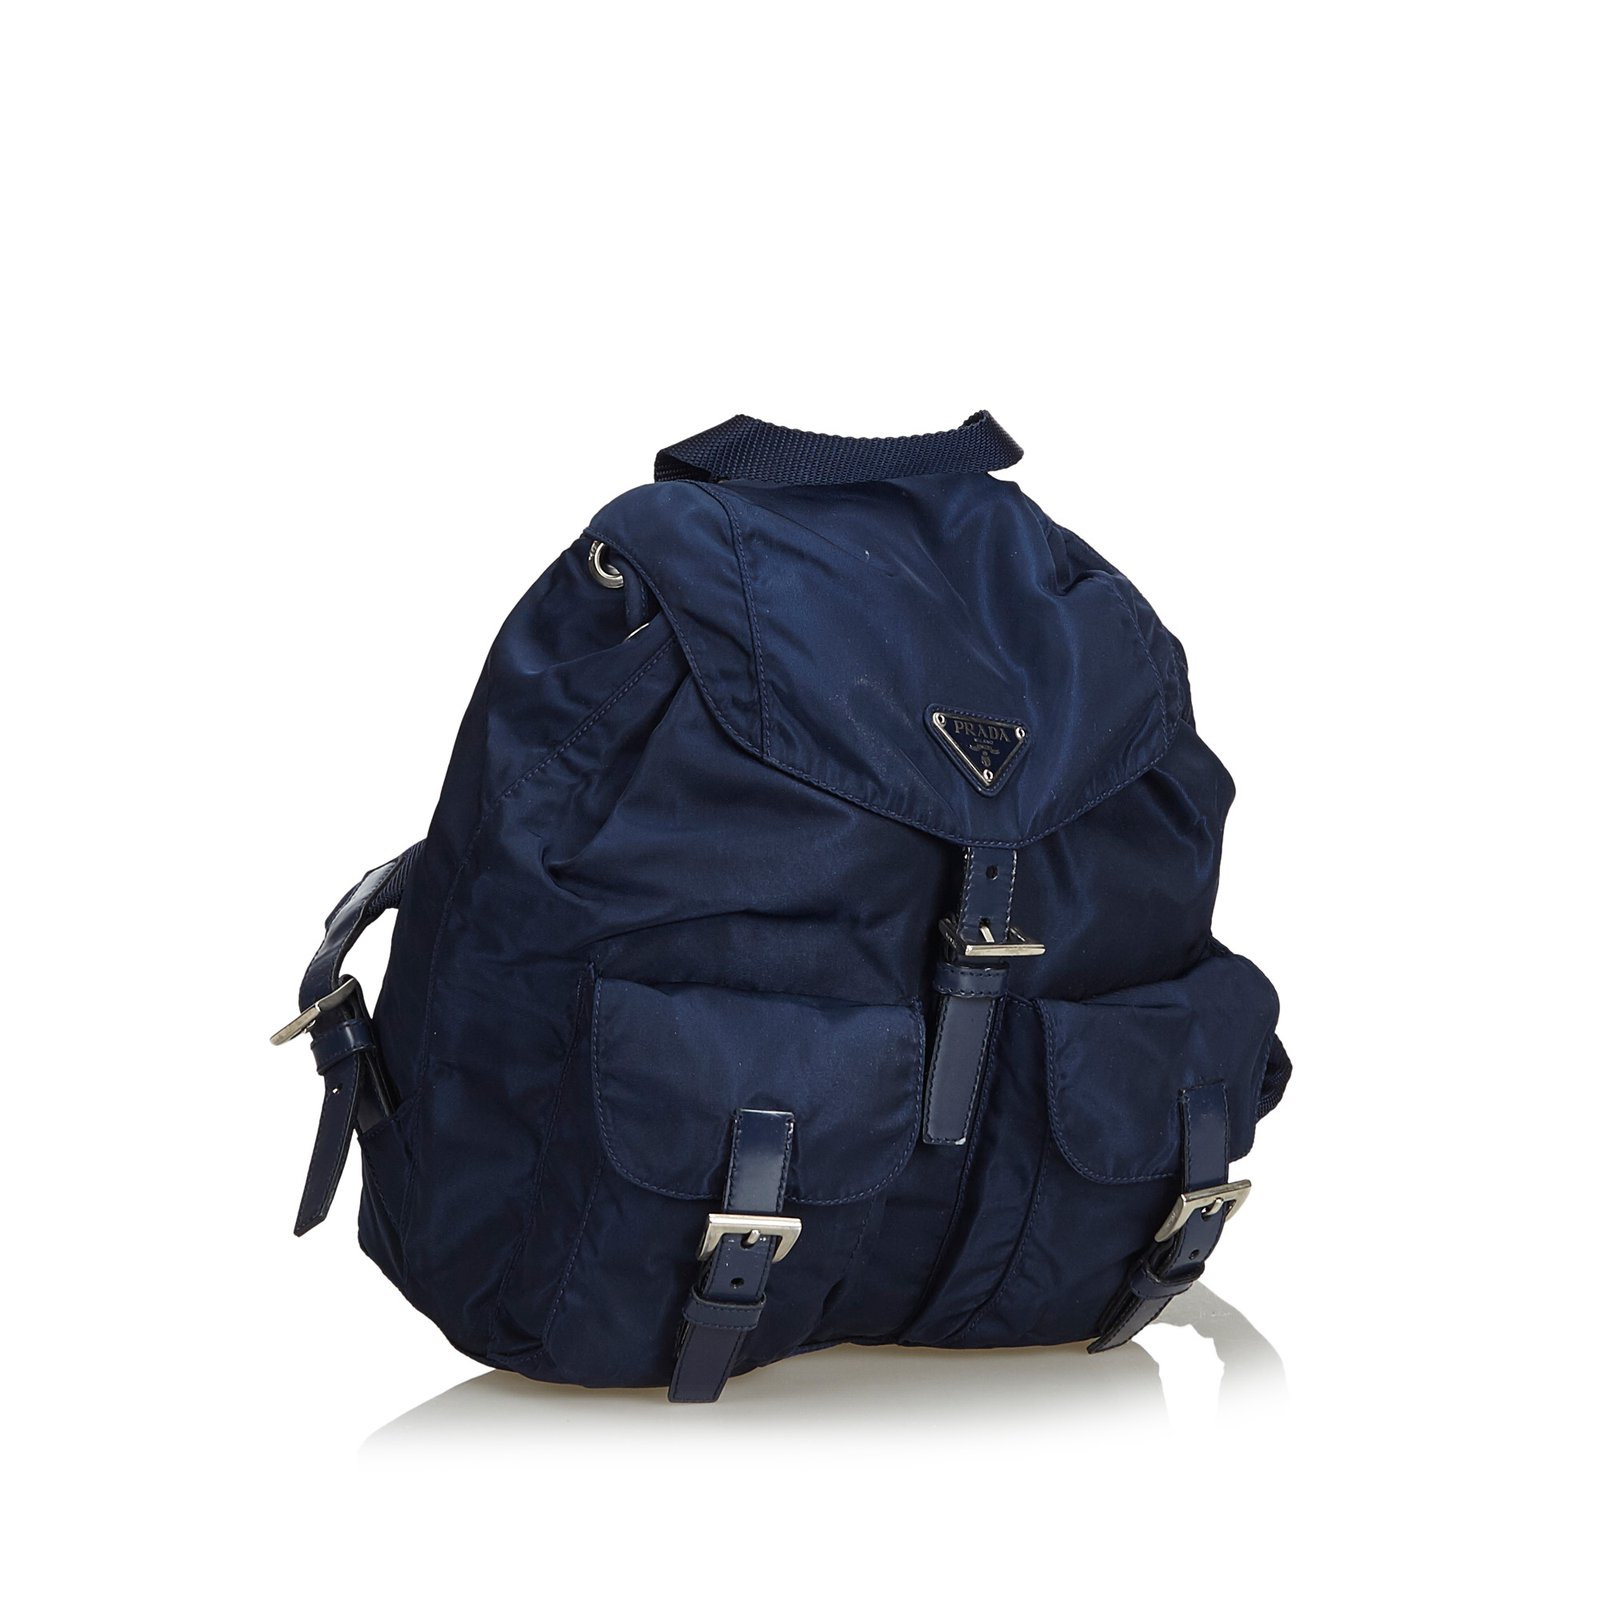 5f1621c053aa4c Prada Nylon Backpack Backpacks Leather,Other,Nylon,Cloth Blue,Navy blue  ref.99257 - Joli Closet